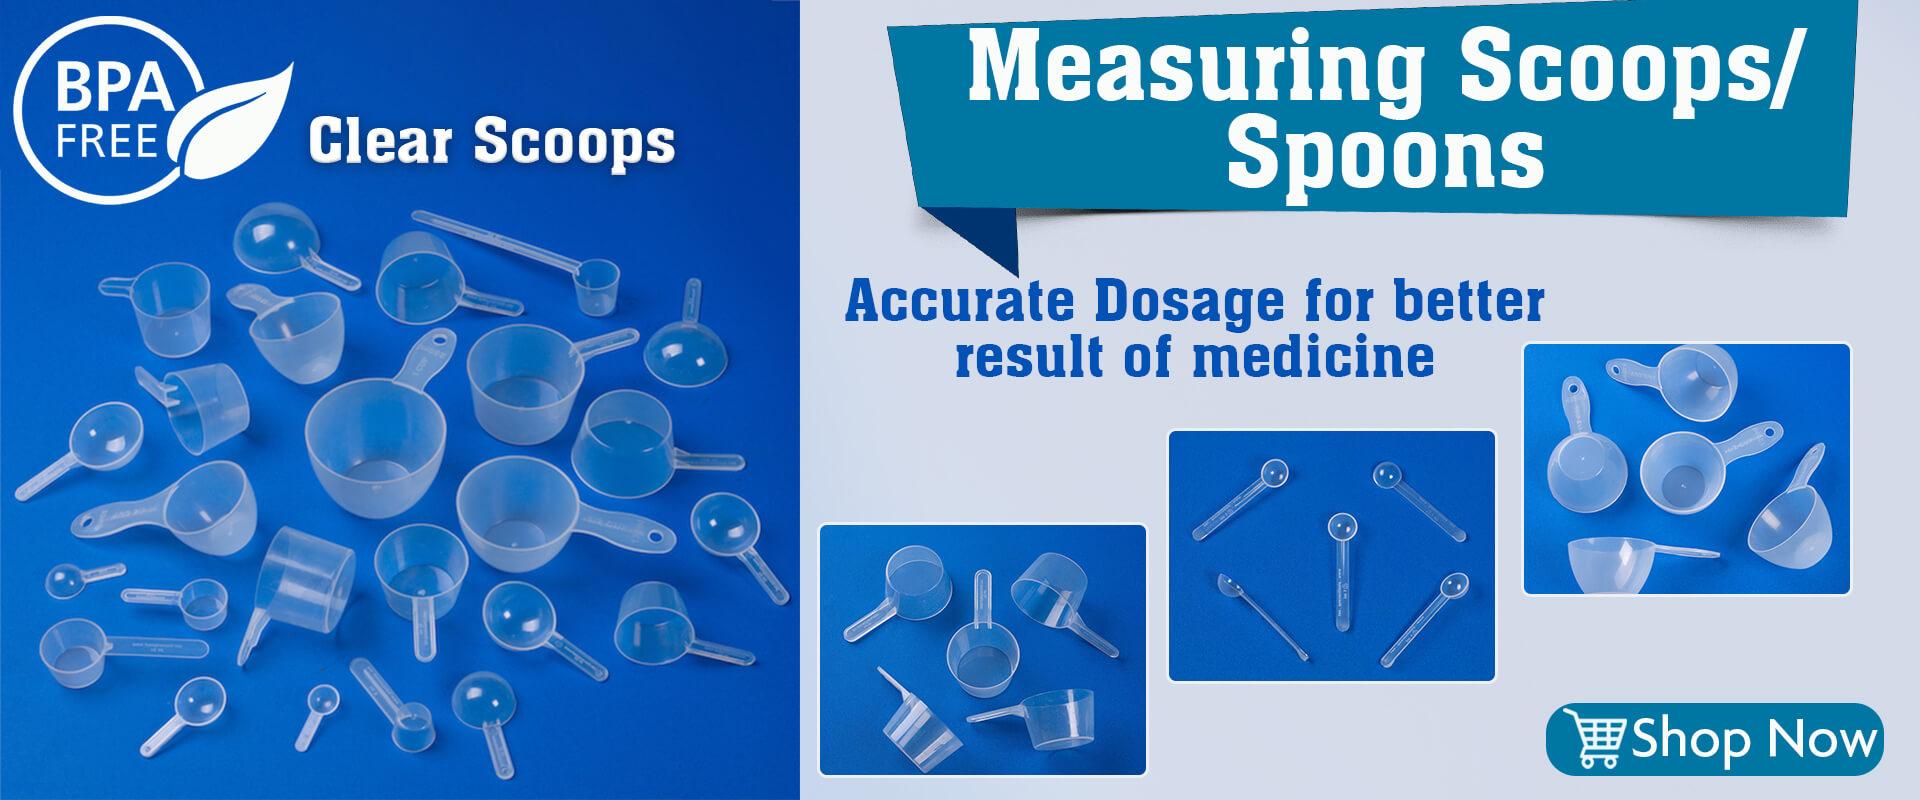 Measuring Scoops